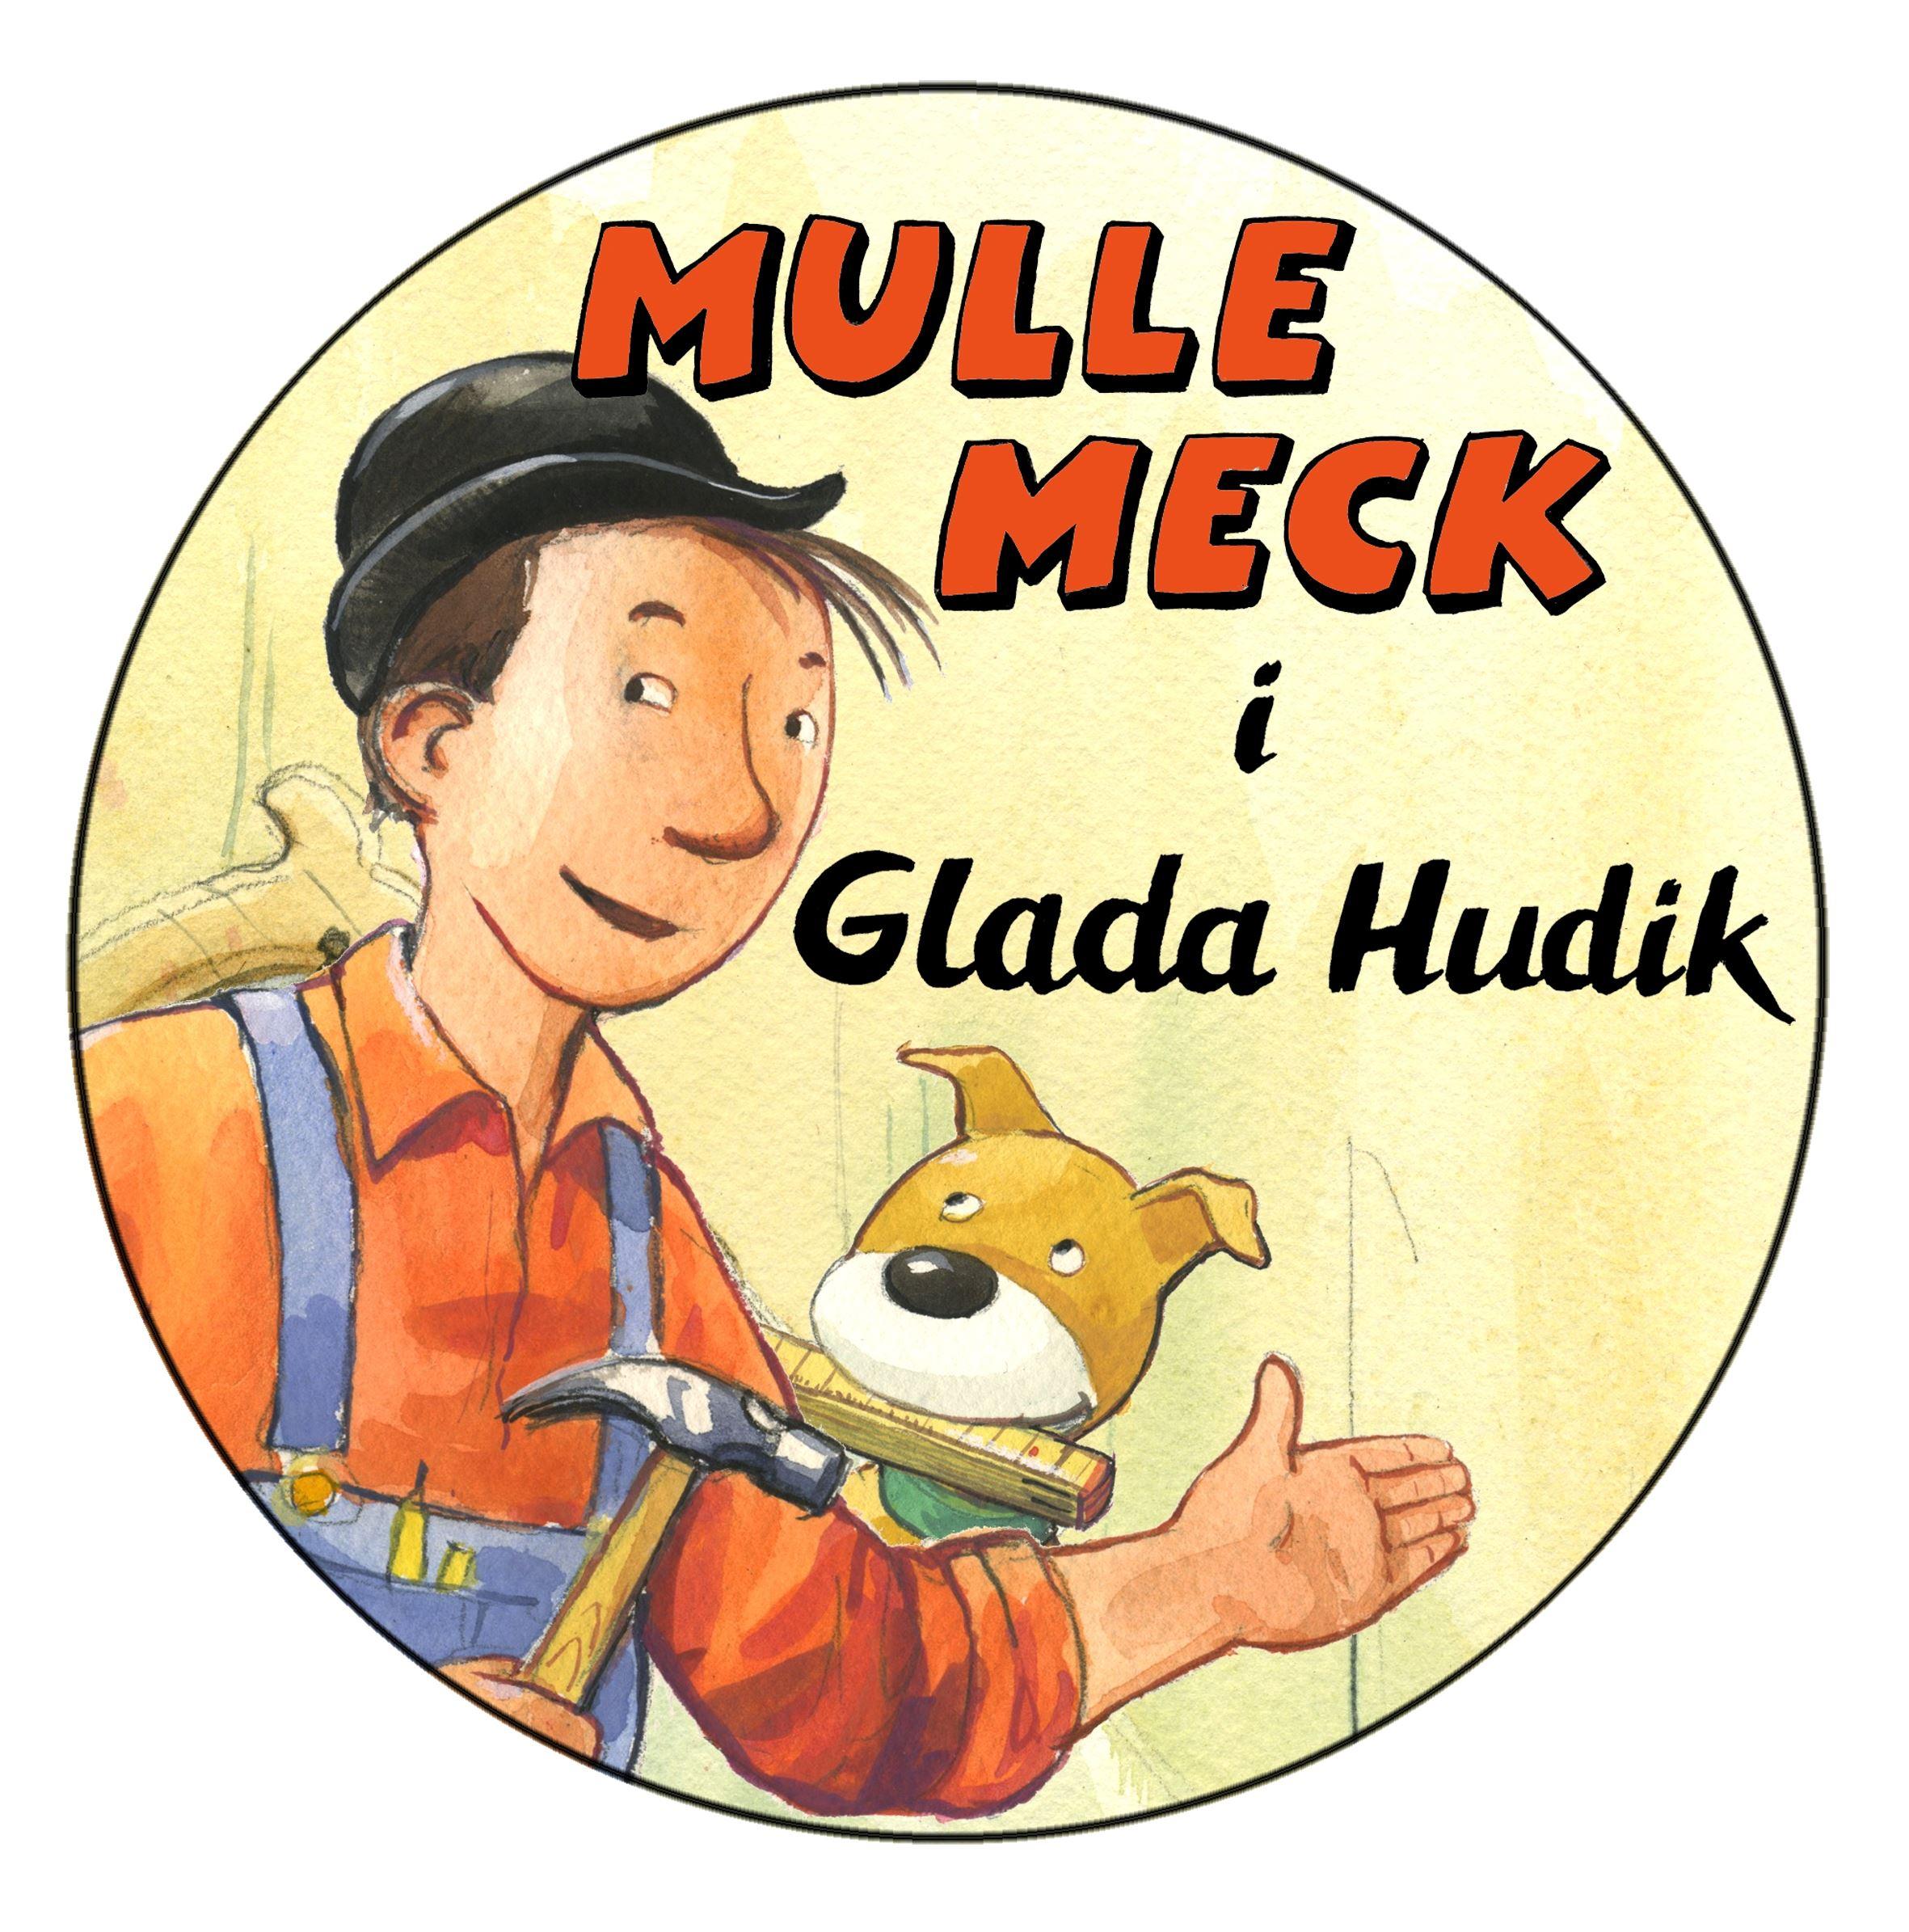 © Mulle Meck i Glada Hudik, Mulle Meck